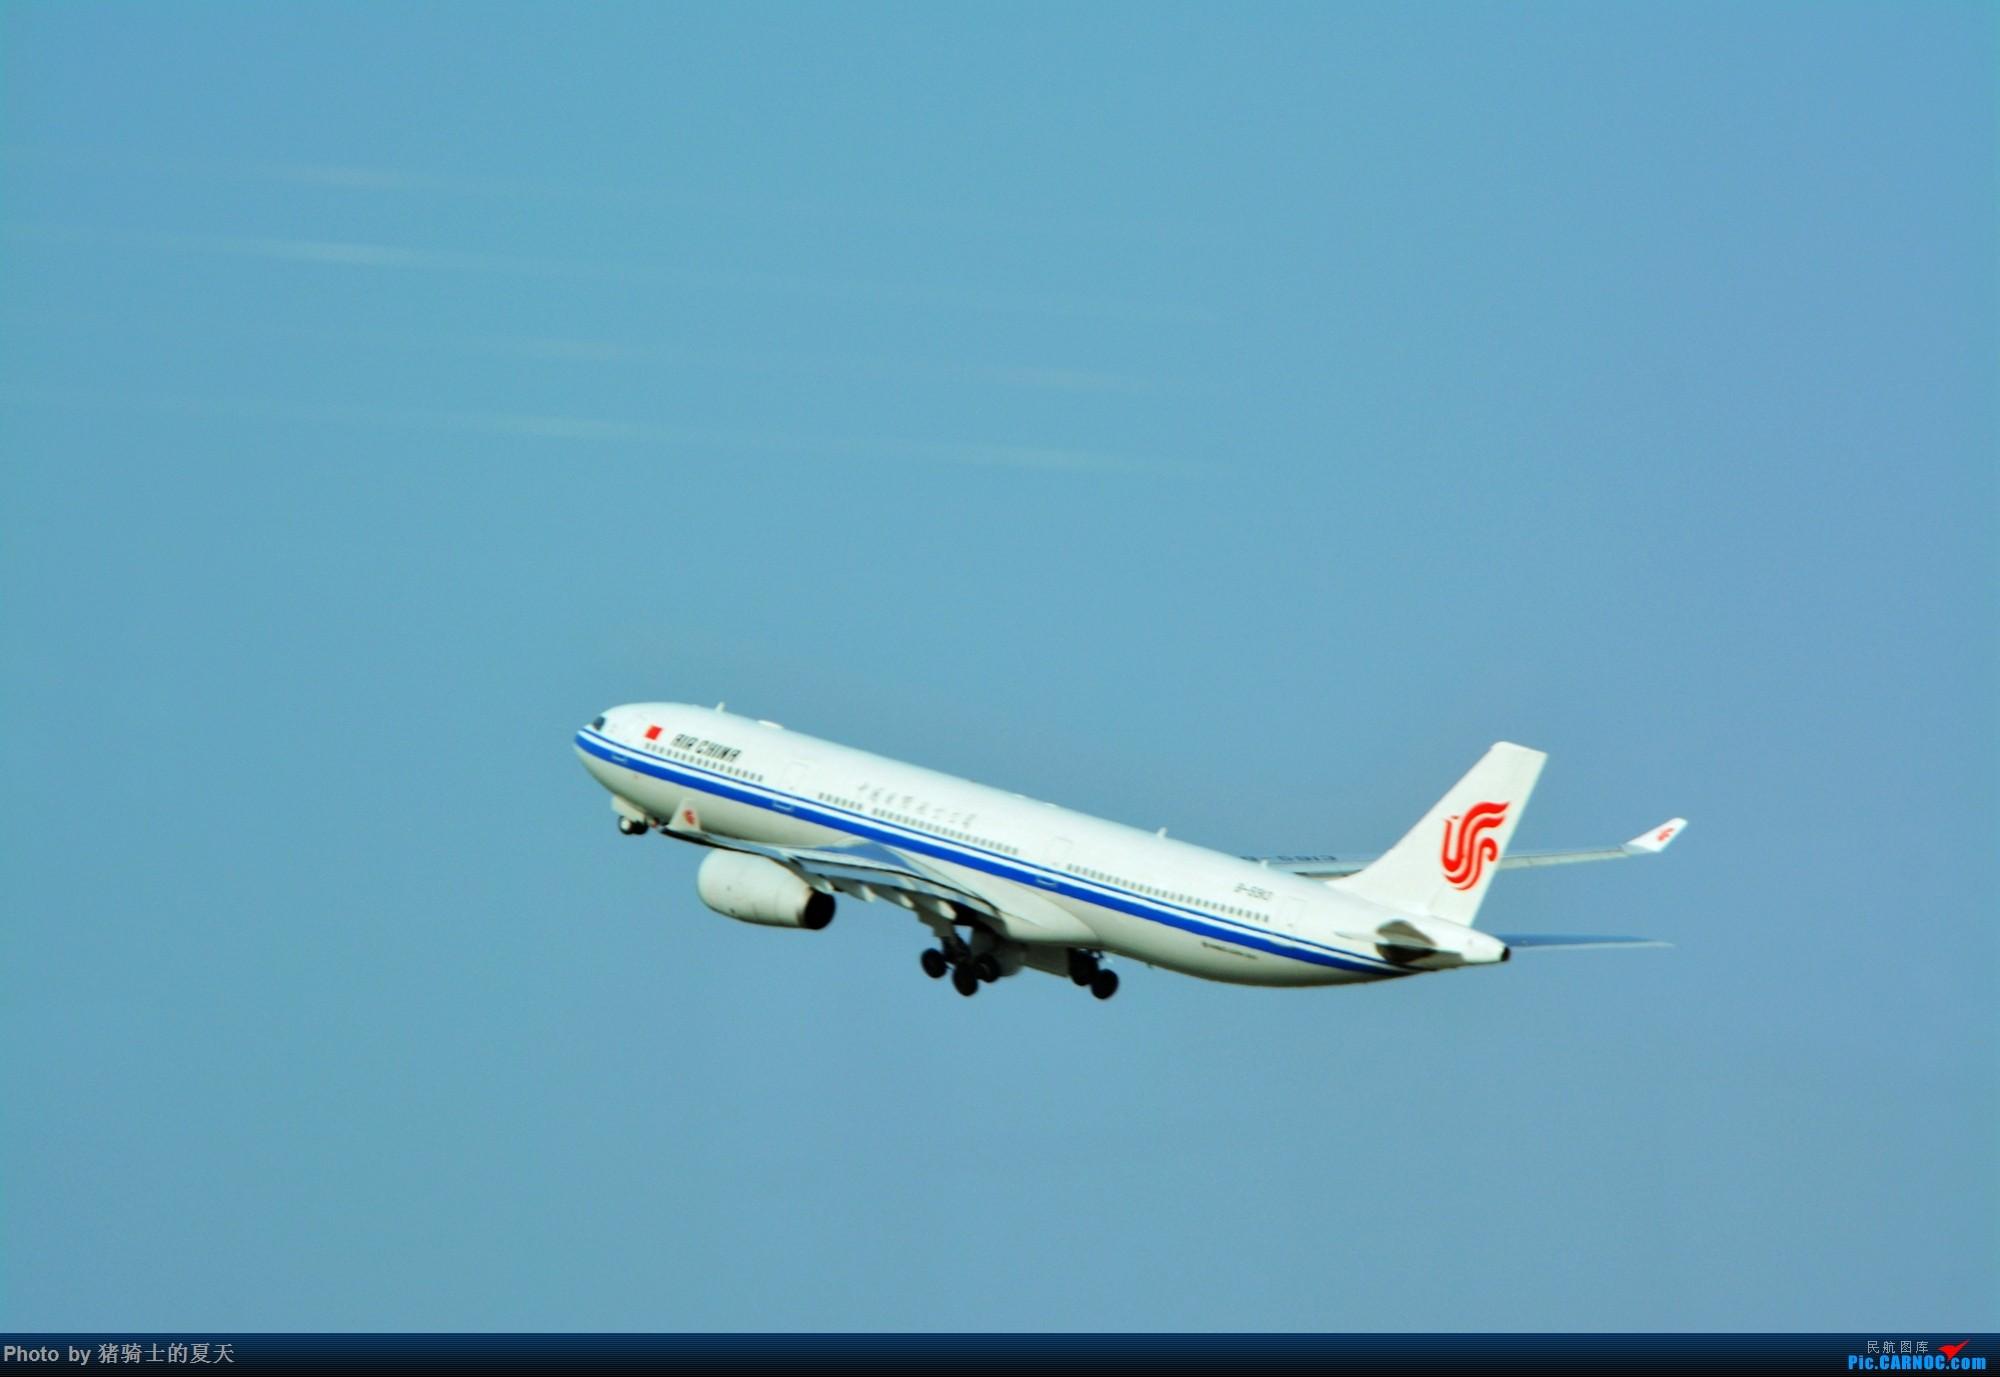 Re:[原创]2017年鸡鸭图 AIRBUS A330-300 B-5913 中国上海虹桥国际机场